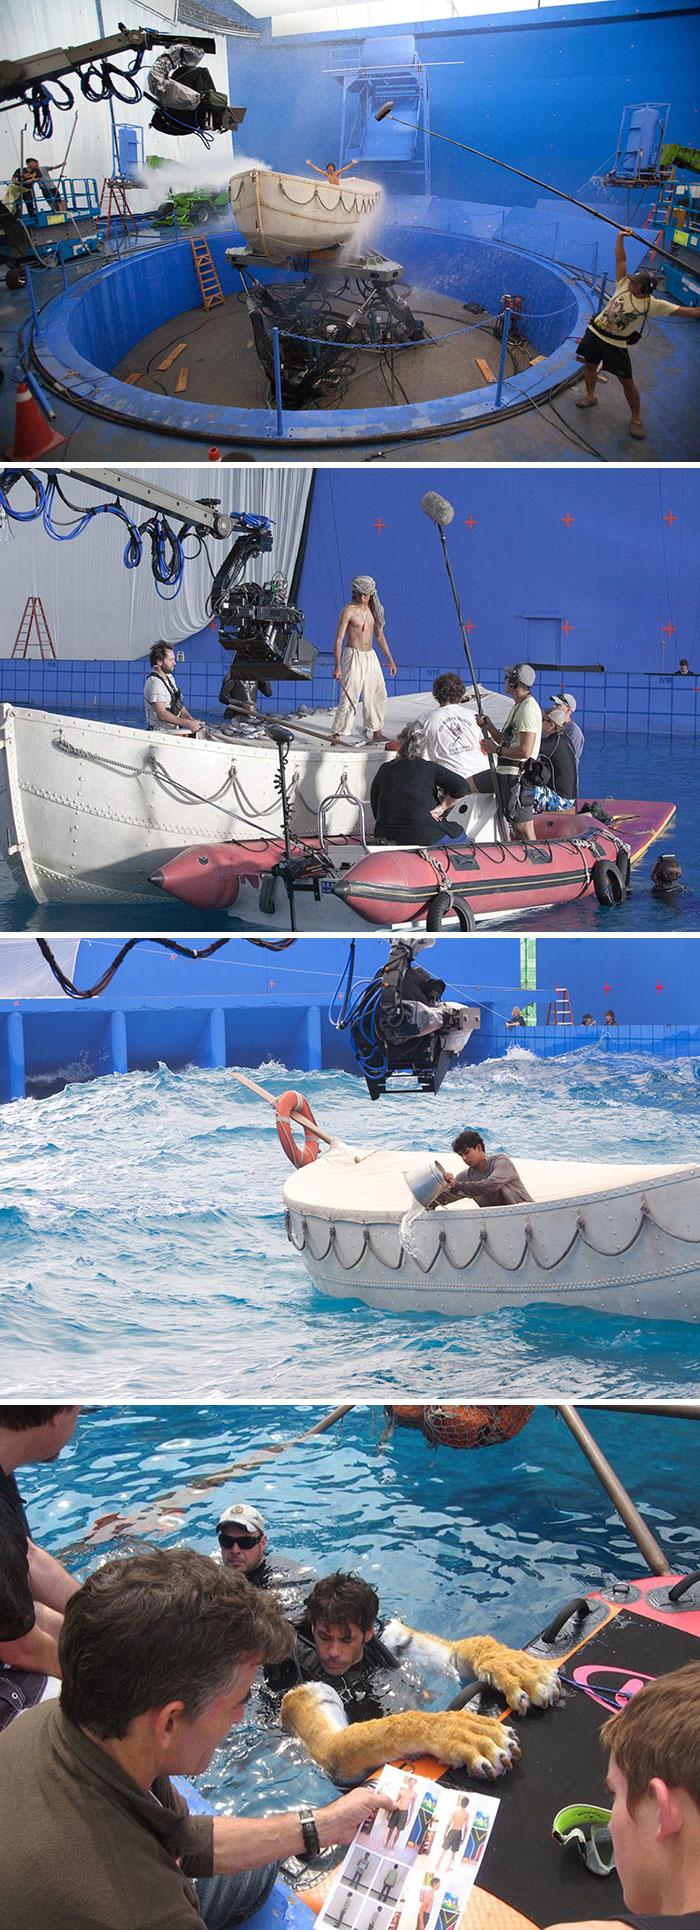 movies behind the scenes 34 5a8c32b5bf111  700 - Por trás das cenas: Foto dos bastidores de filmes que marcaram época